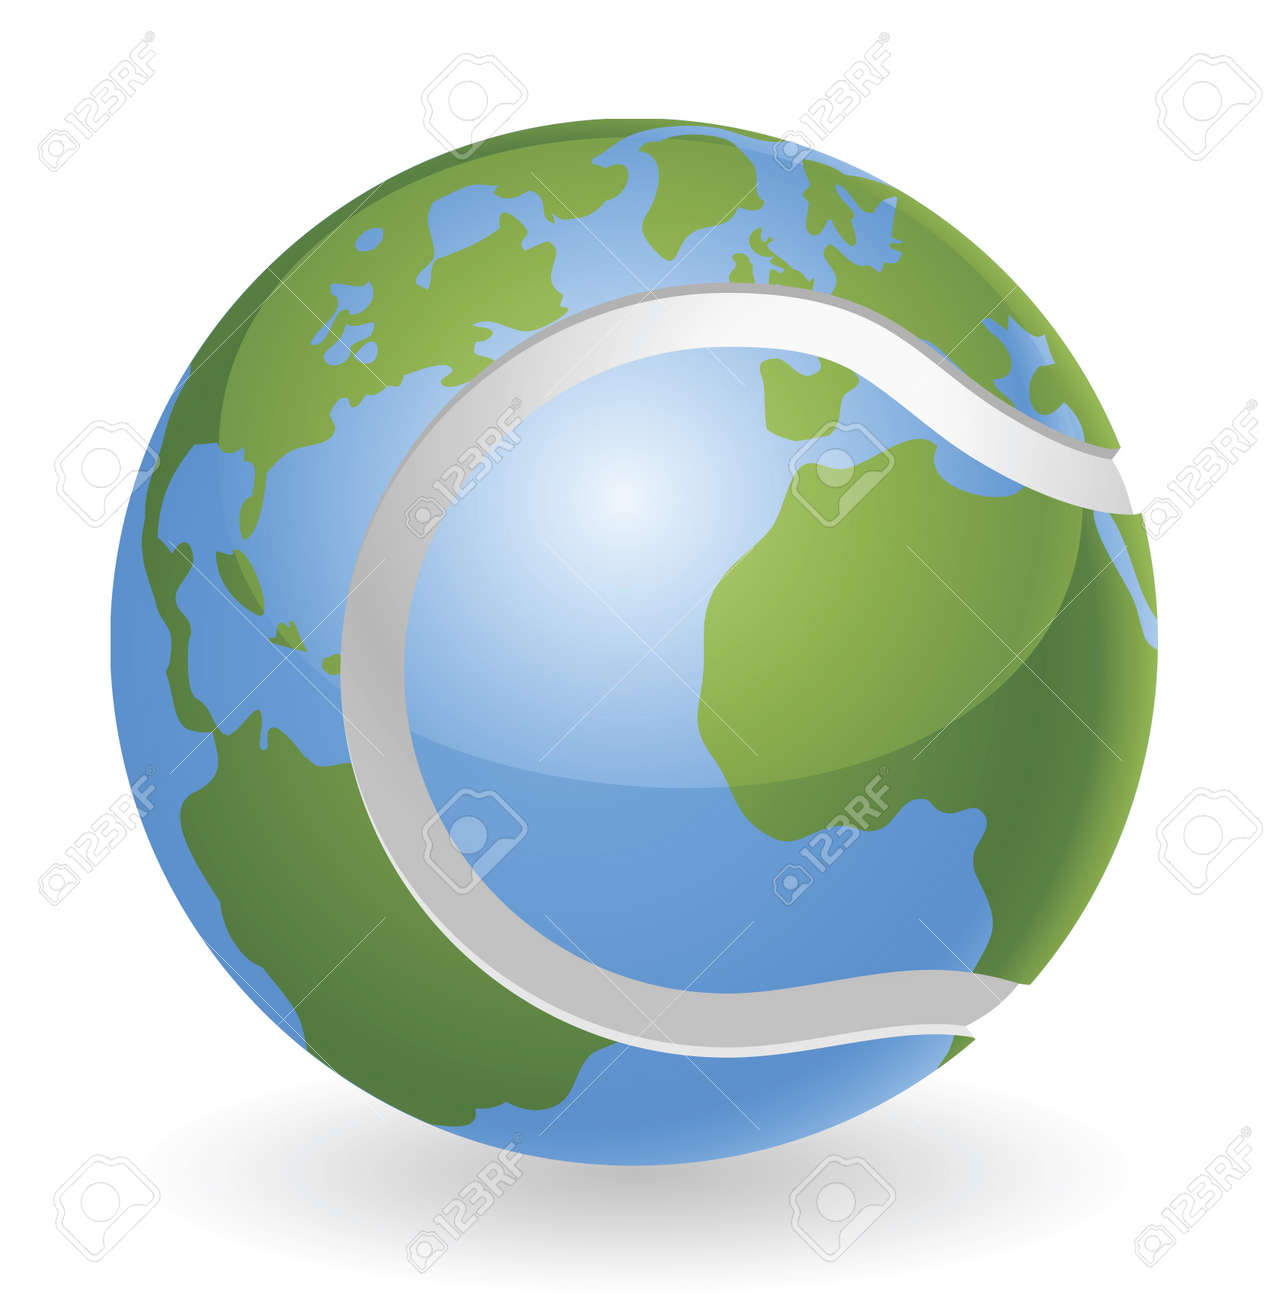 World globe tennis ball concept illustration Stock Vector - 9931677